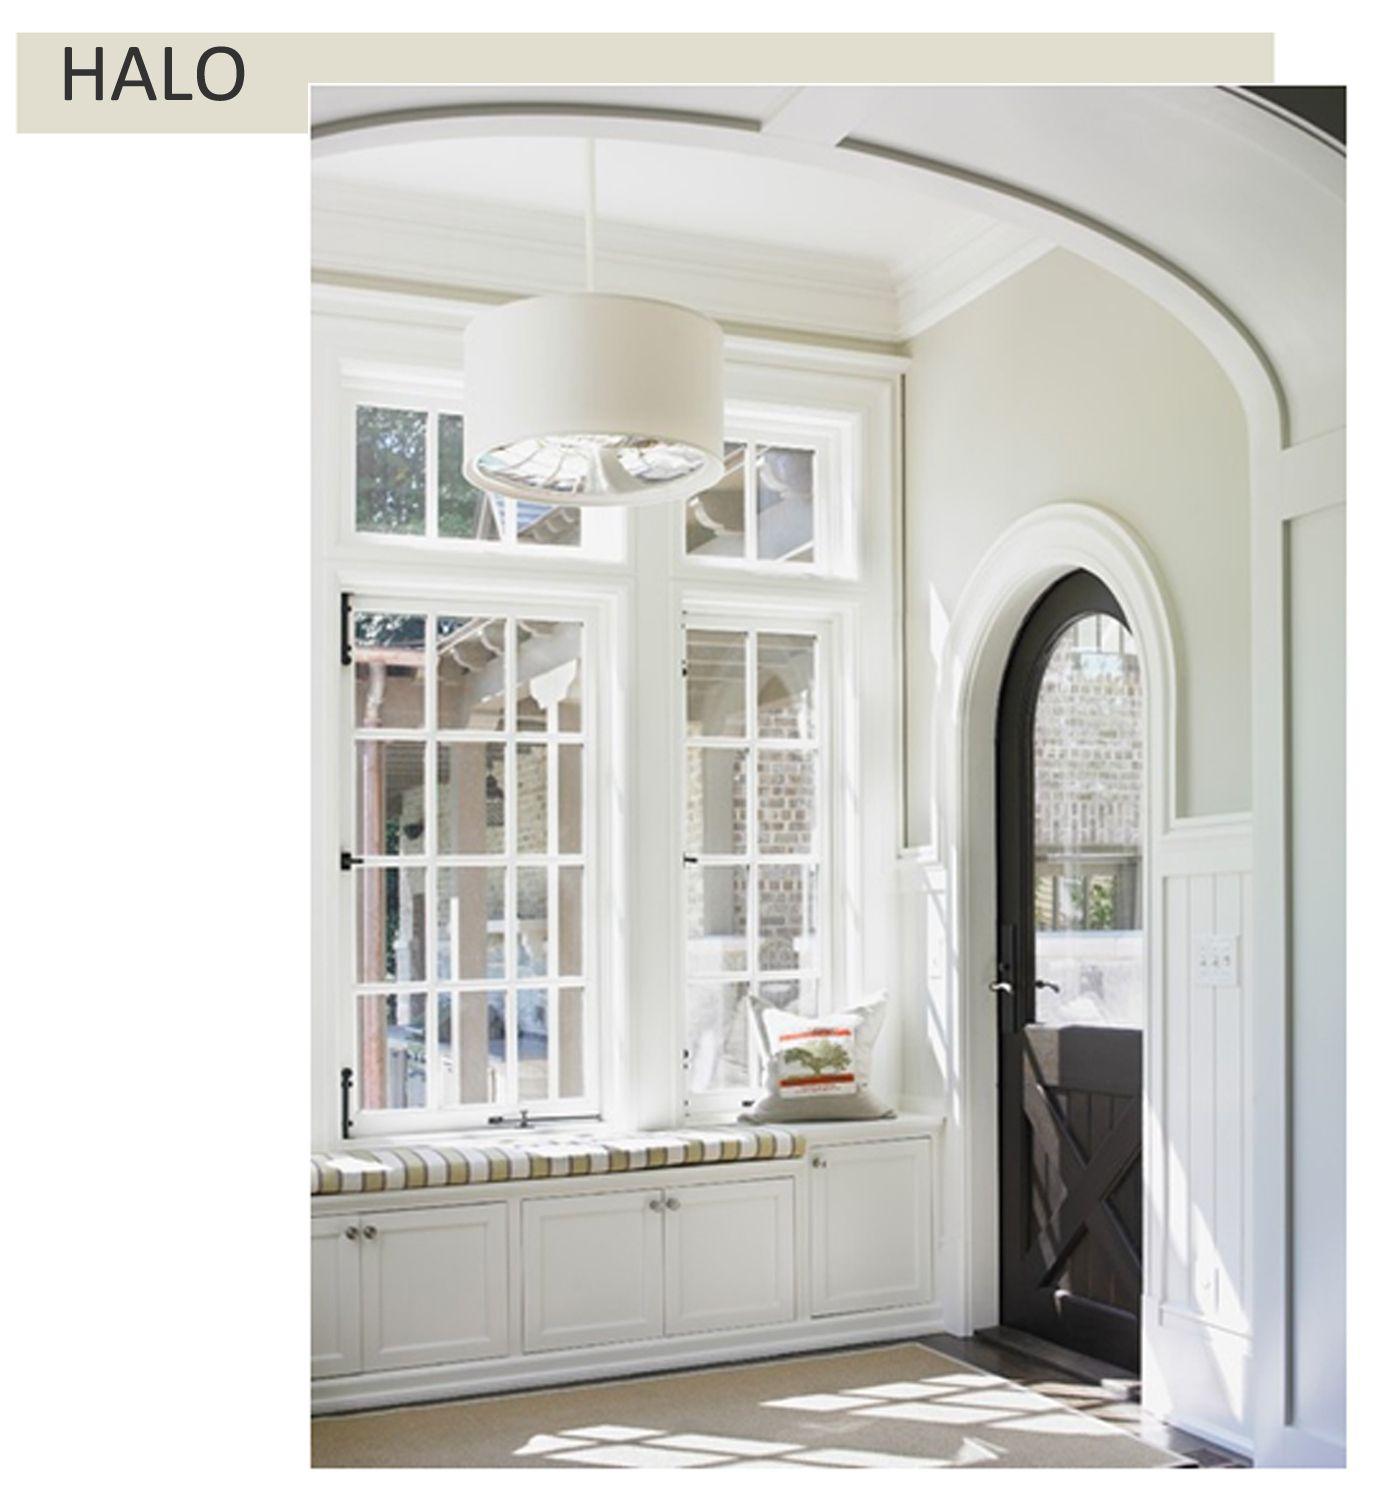 Most popular living room paint colors 2012 - Top 10 Interior Paint Colors 2012